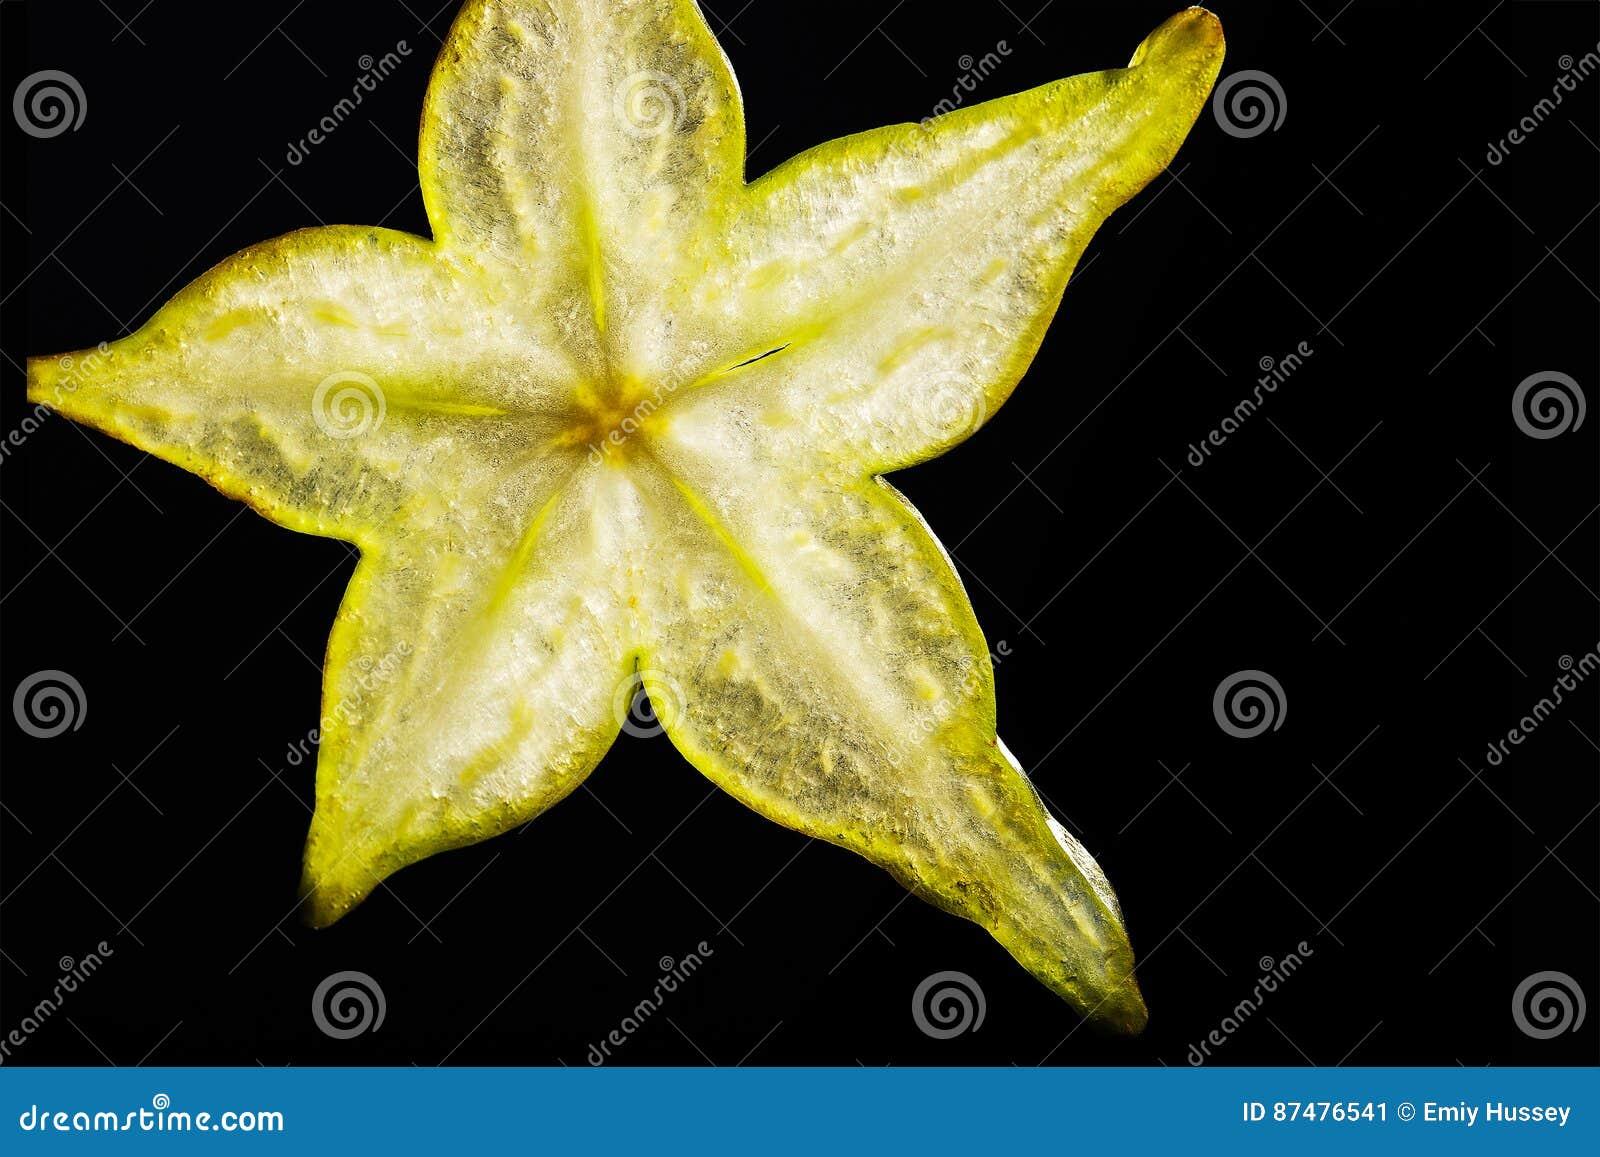 Starfruit切片